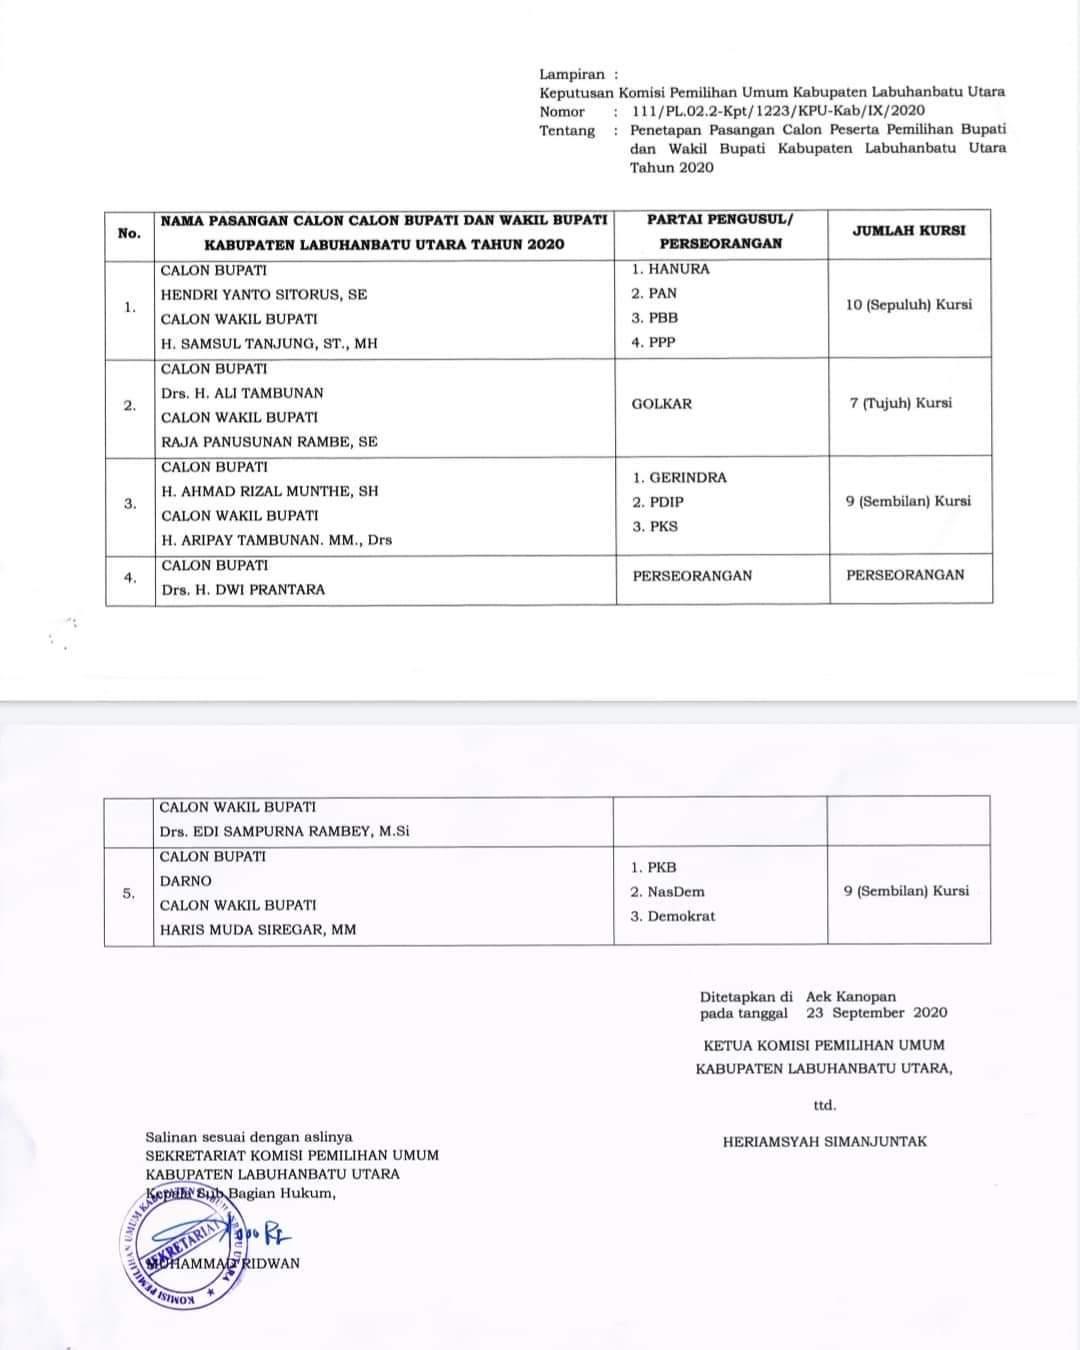 Kpu Kabupaten Labuhanbatu Utara Tetapkan 5 Paslon Bupati Dan Wakil Bupati Labura Tahun 2020 Suara Buruh Nasional